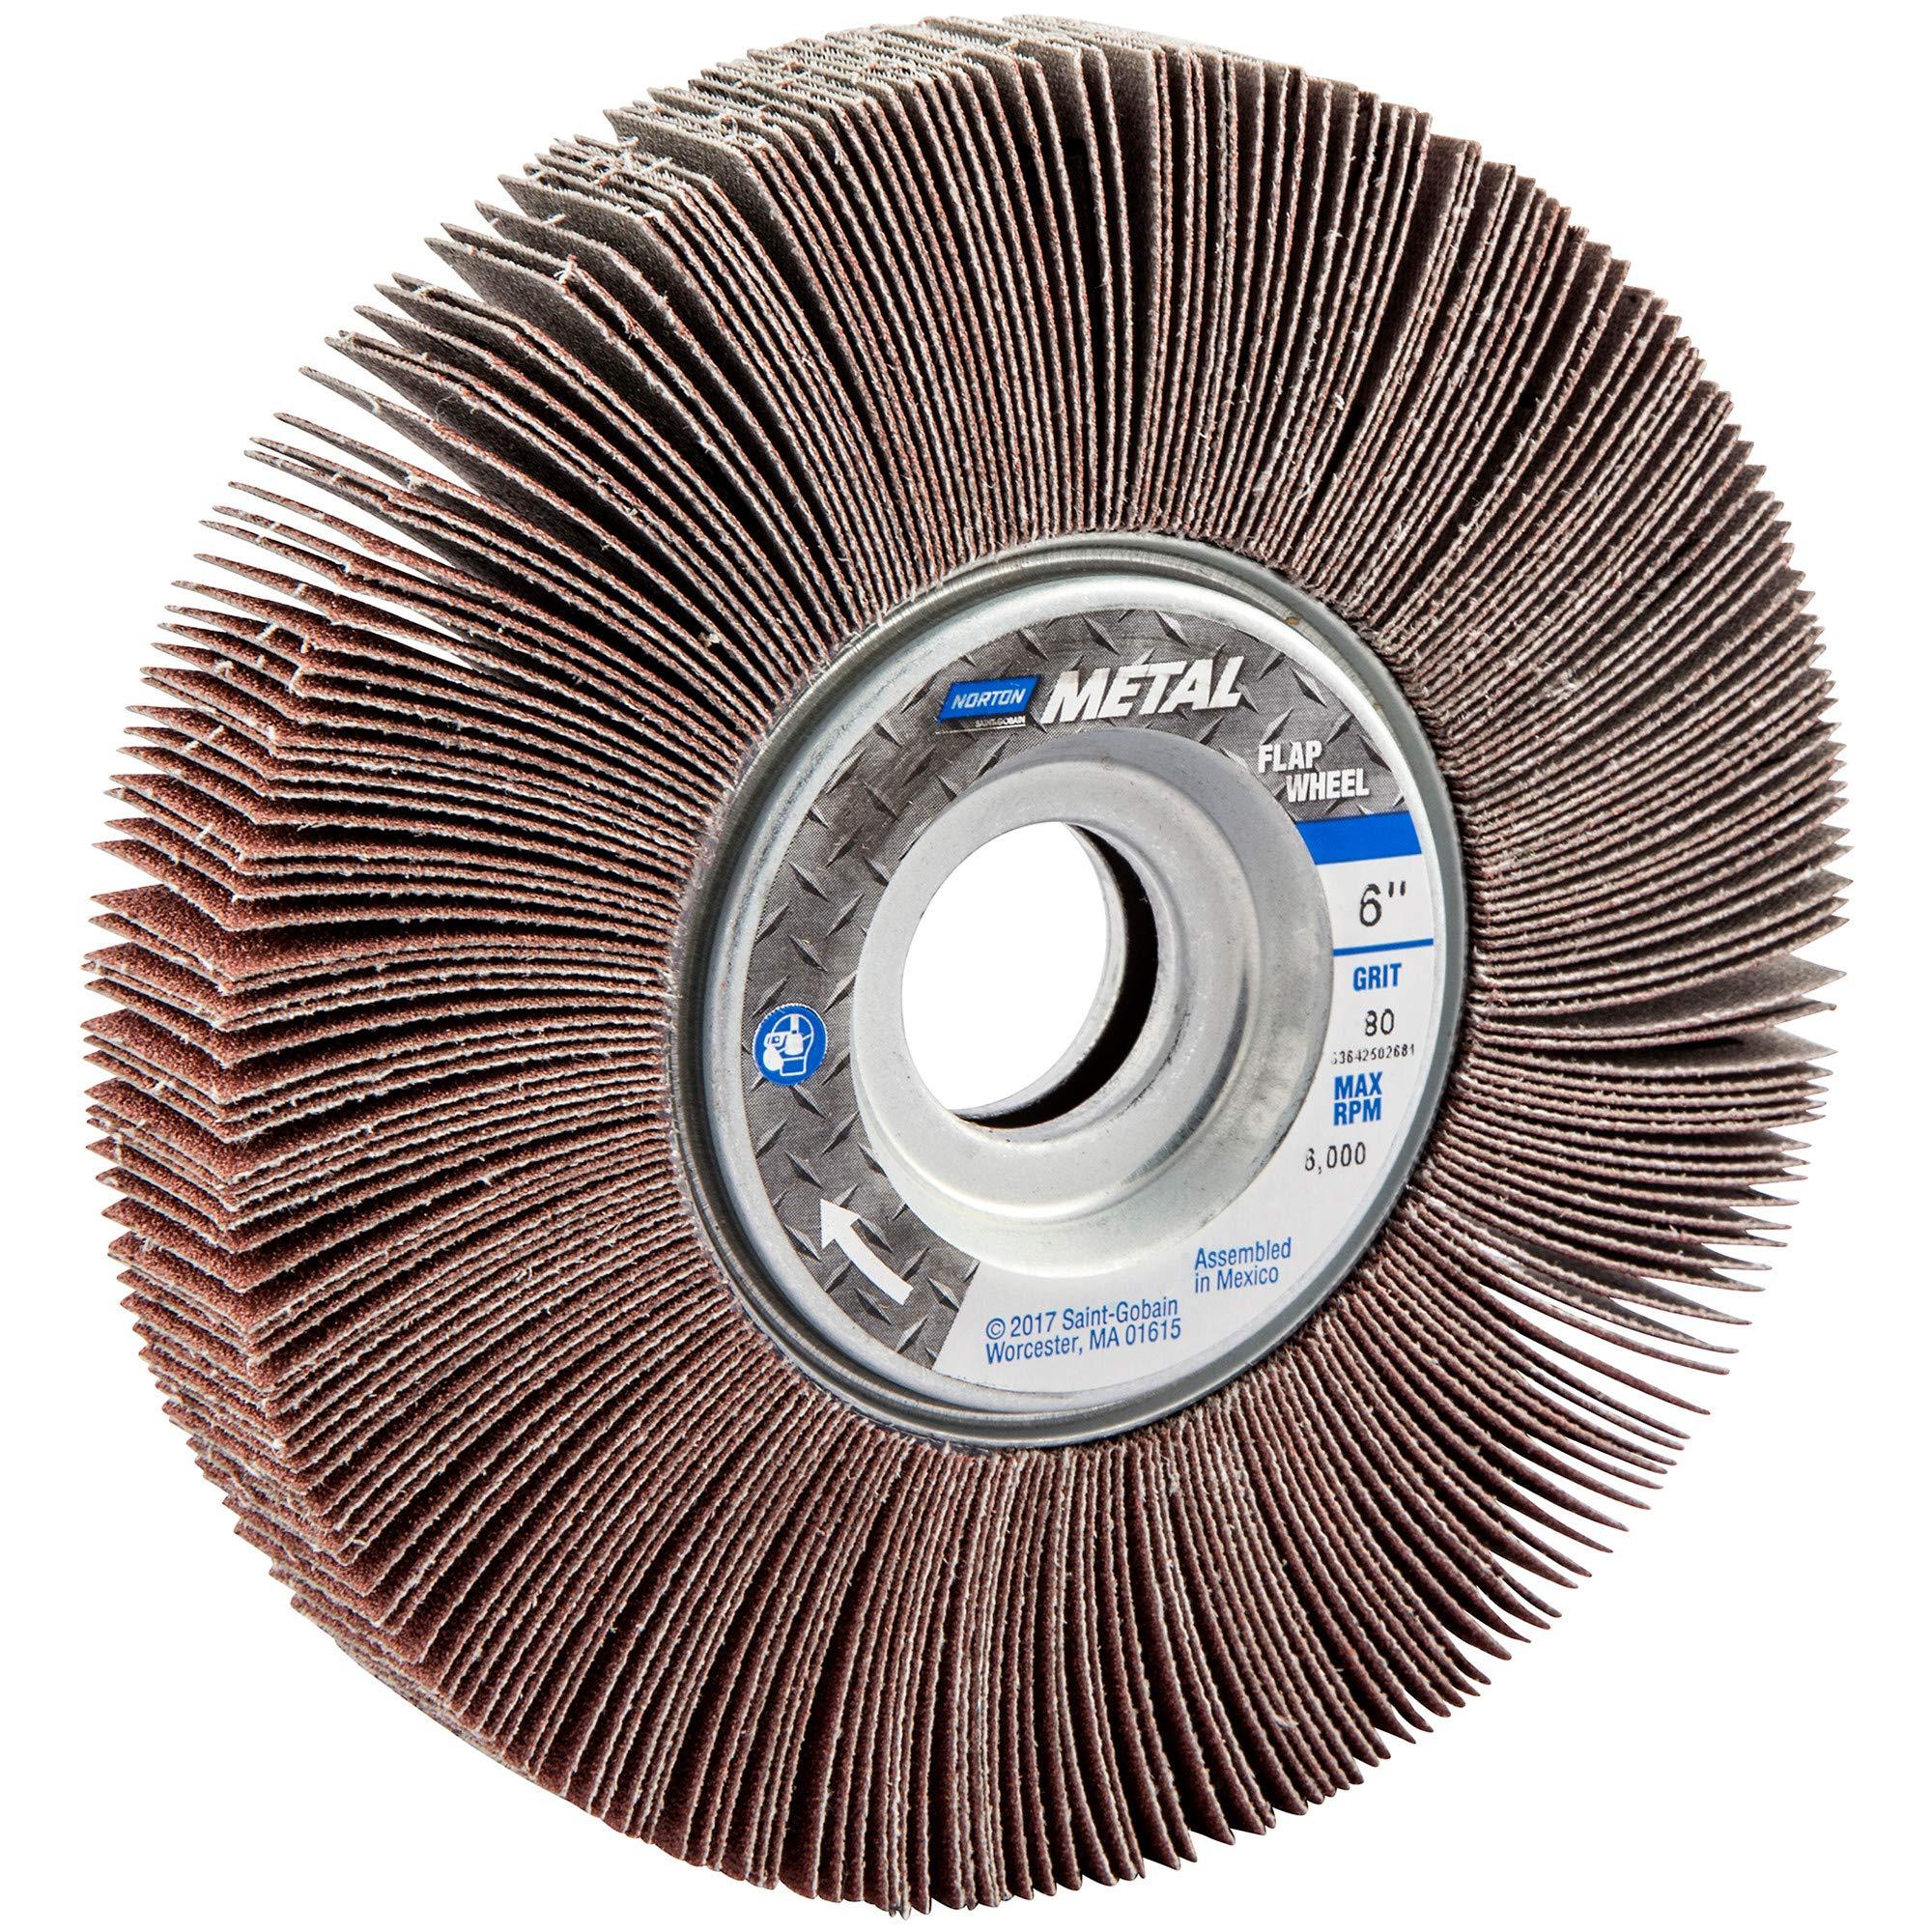 Norton Metalite R265 Abrasive Flap Wheel, 1'' Arbor, Round Hole, Aluminum Oxide, 6'' Dia., 1'' Face Width, Grit 80, 6200 Max RPM (Pack of 1)